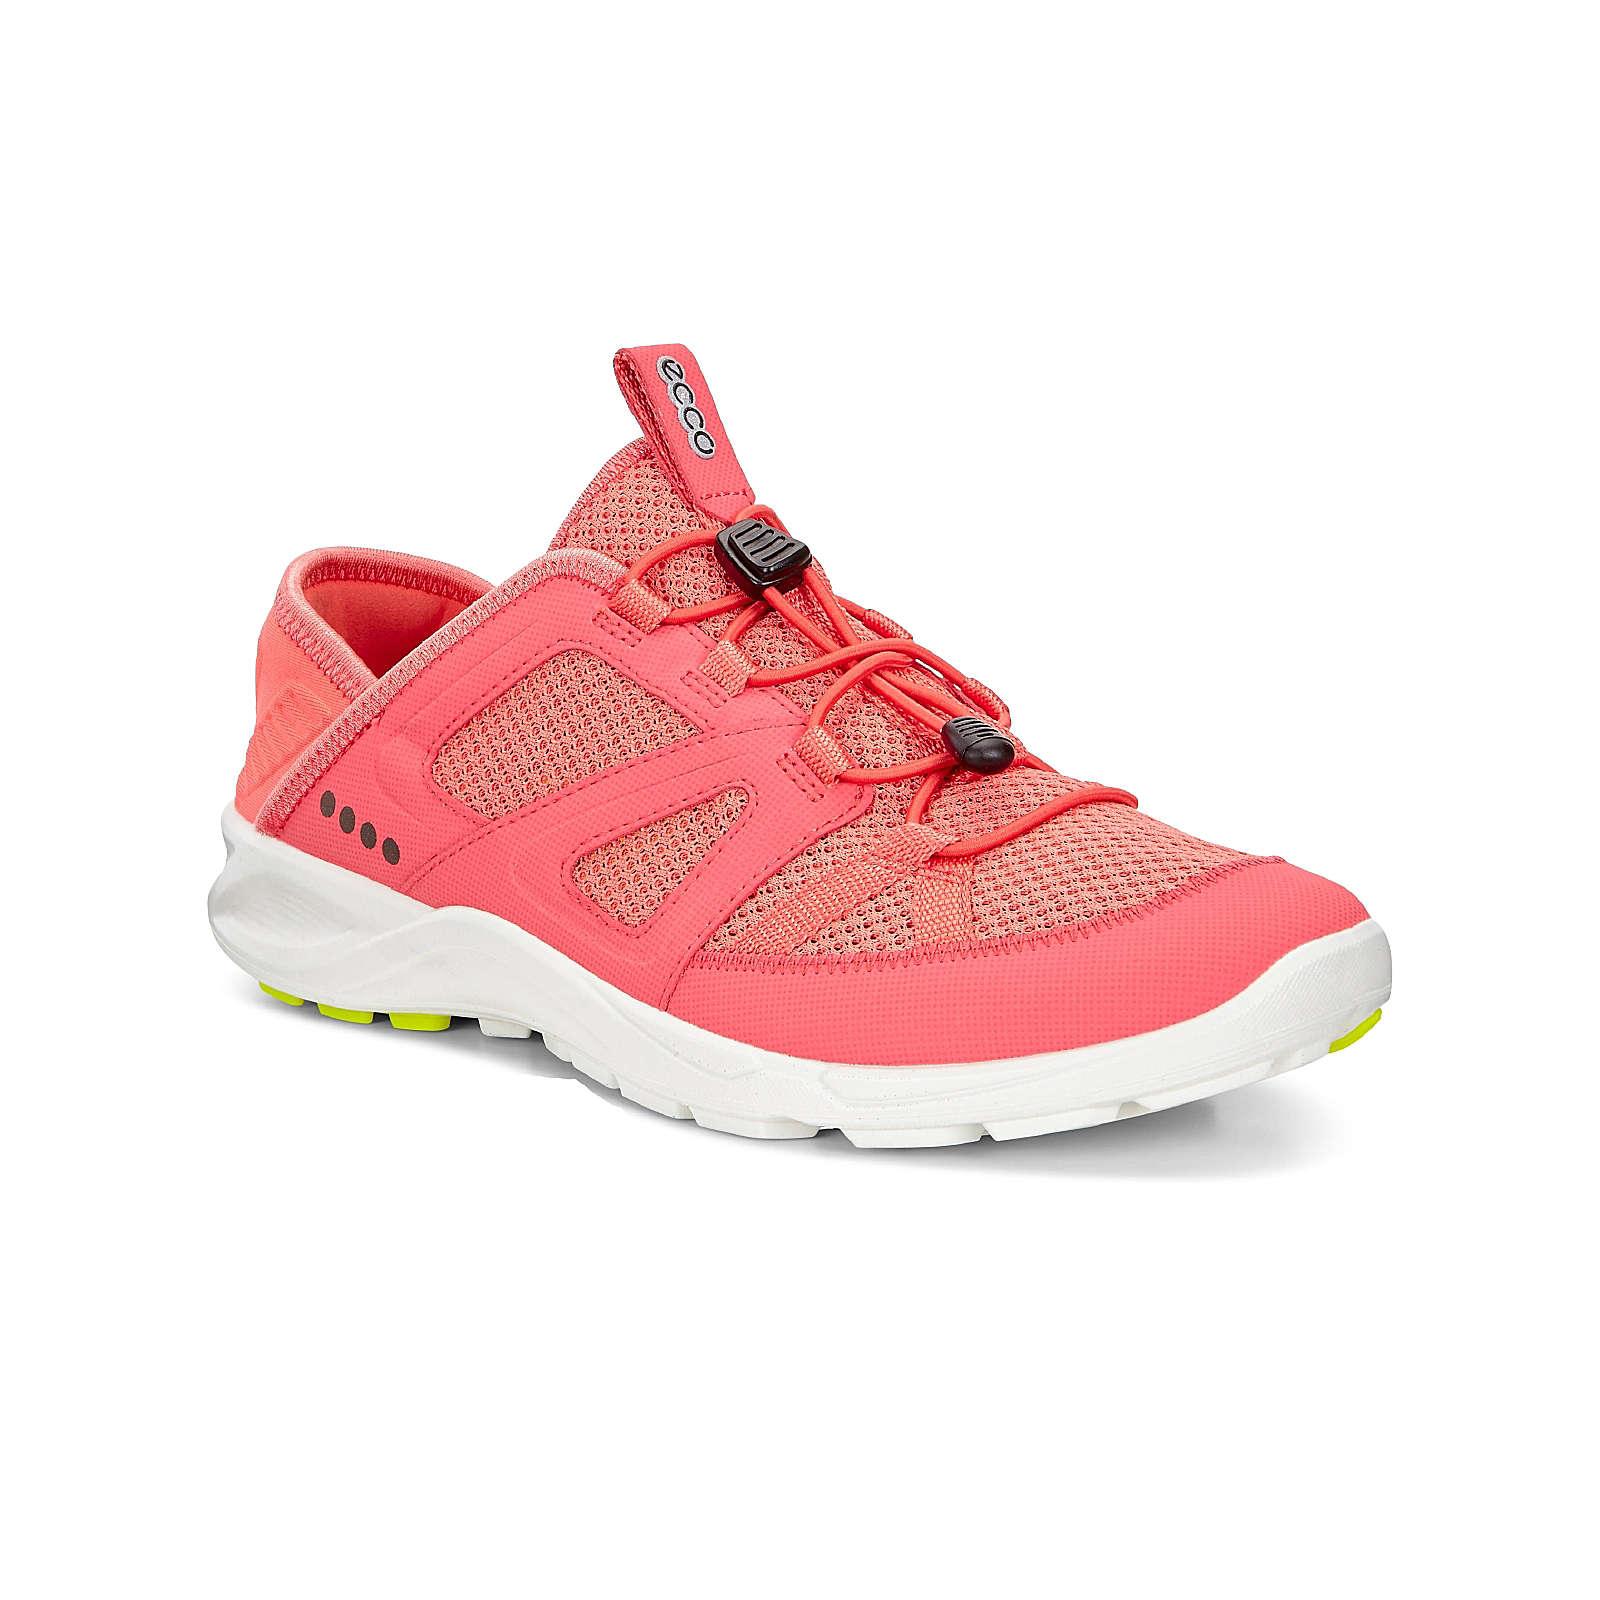 ecco Sneakers Low Terracruise Ladies pink Damen Gr. 38